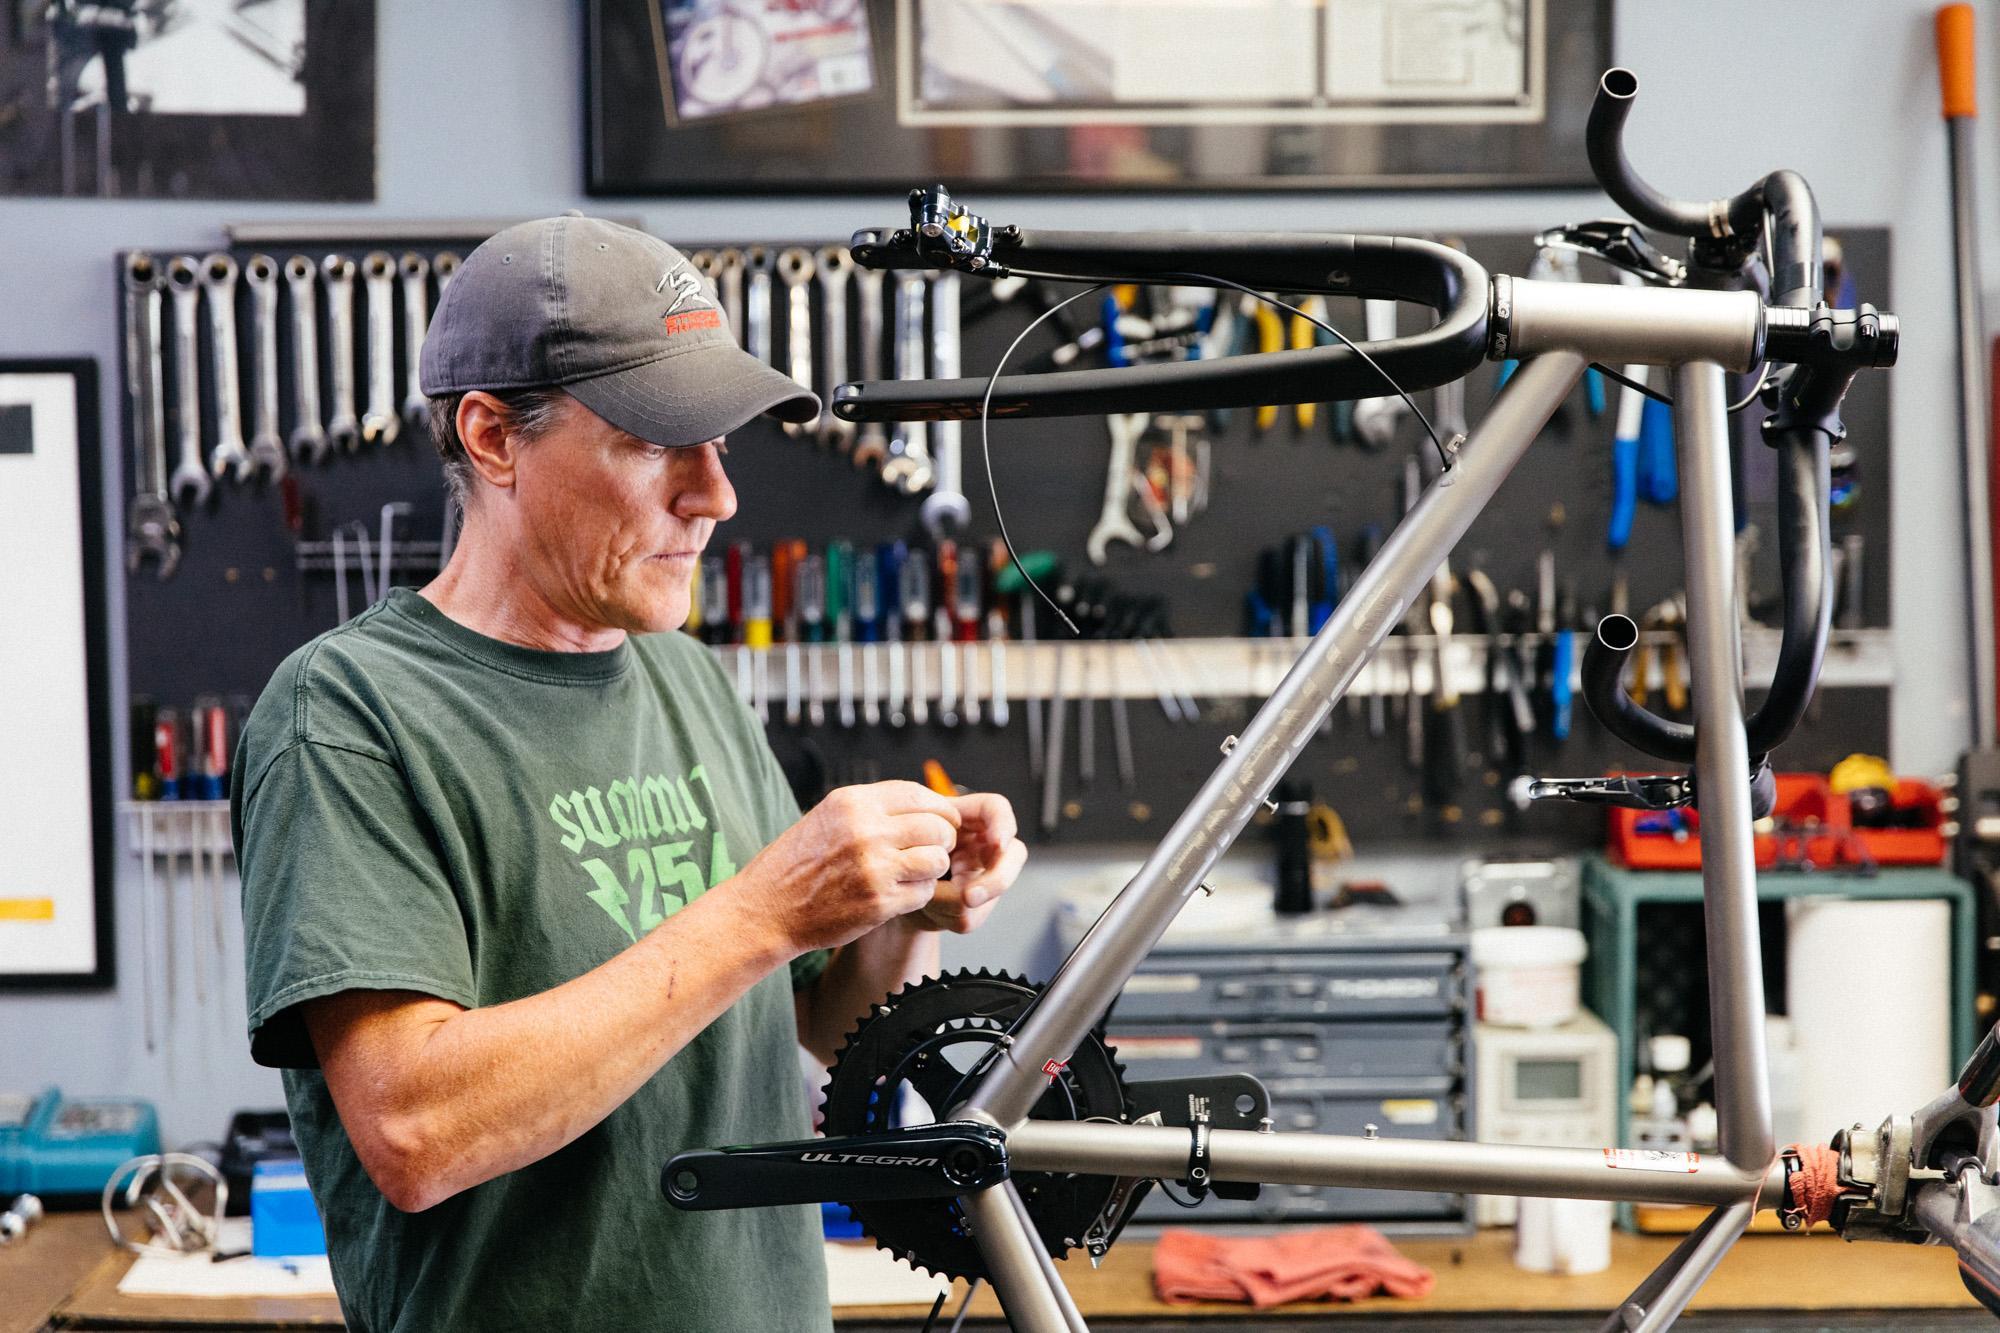 Carl building bikes.